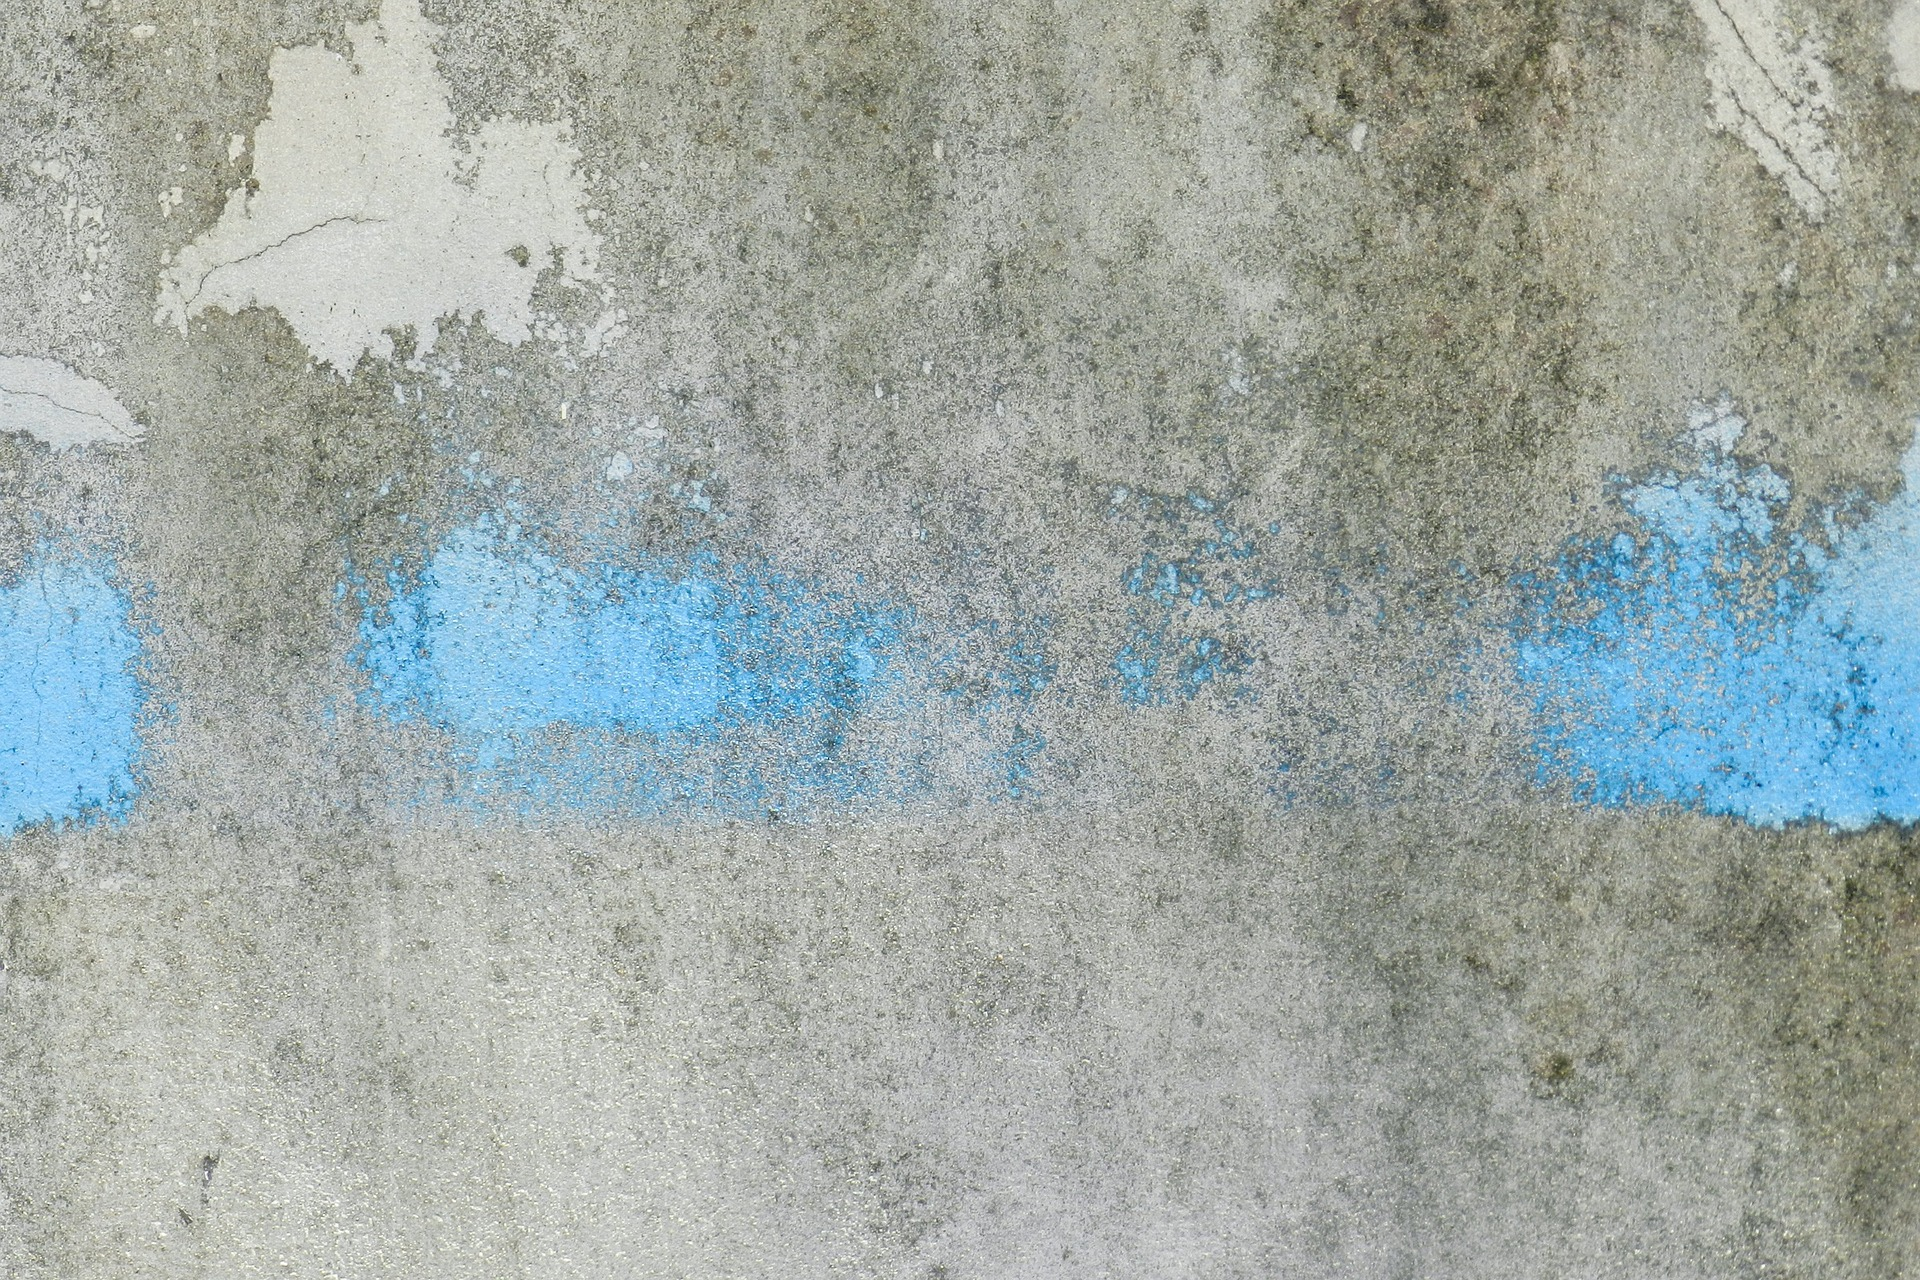 wall-175501_1920.jpg